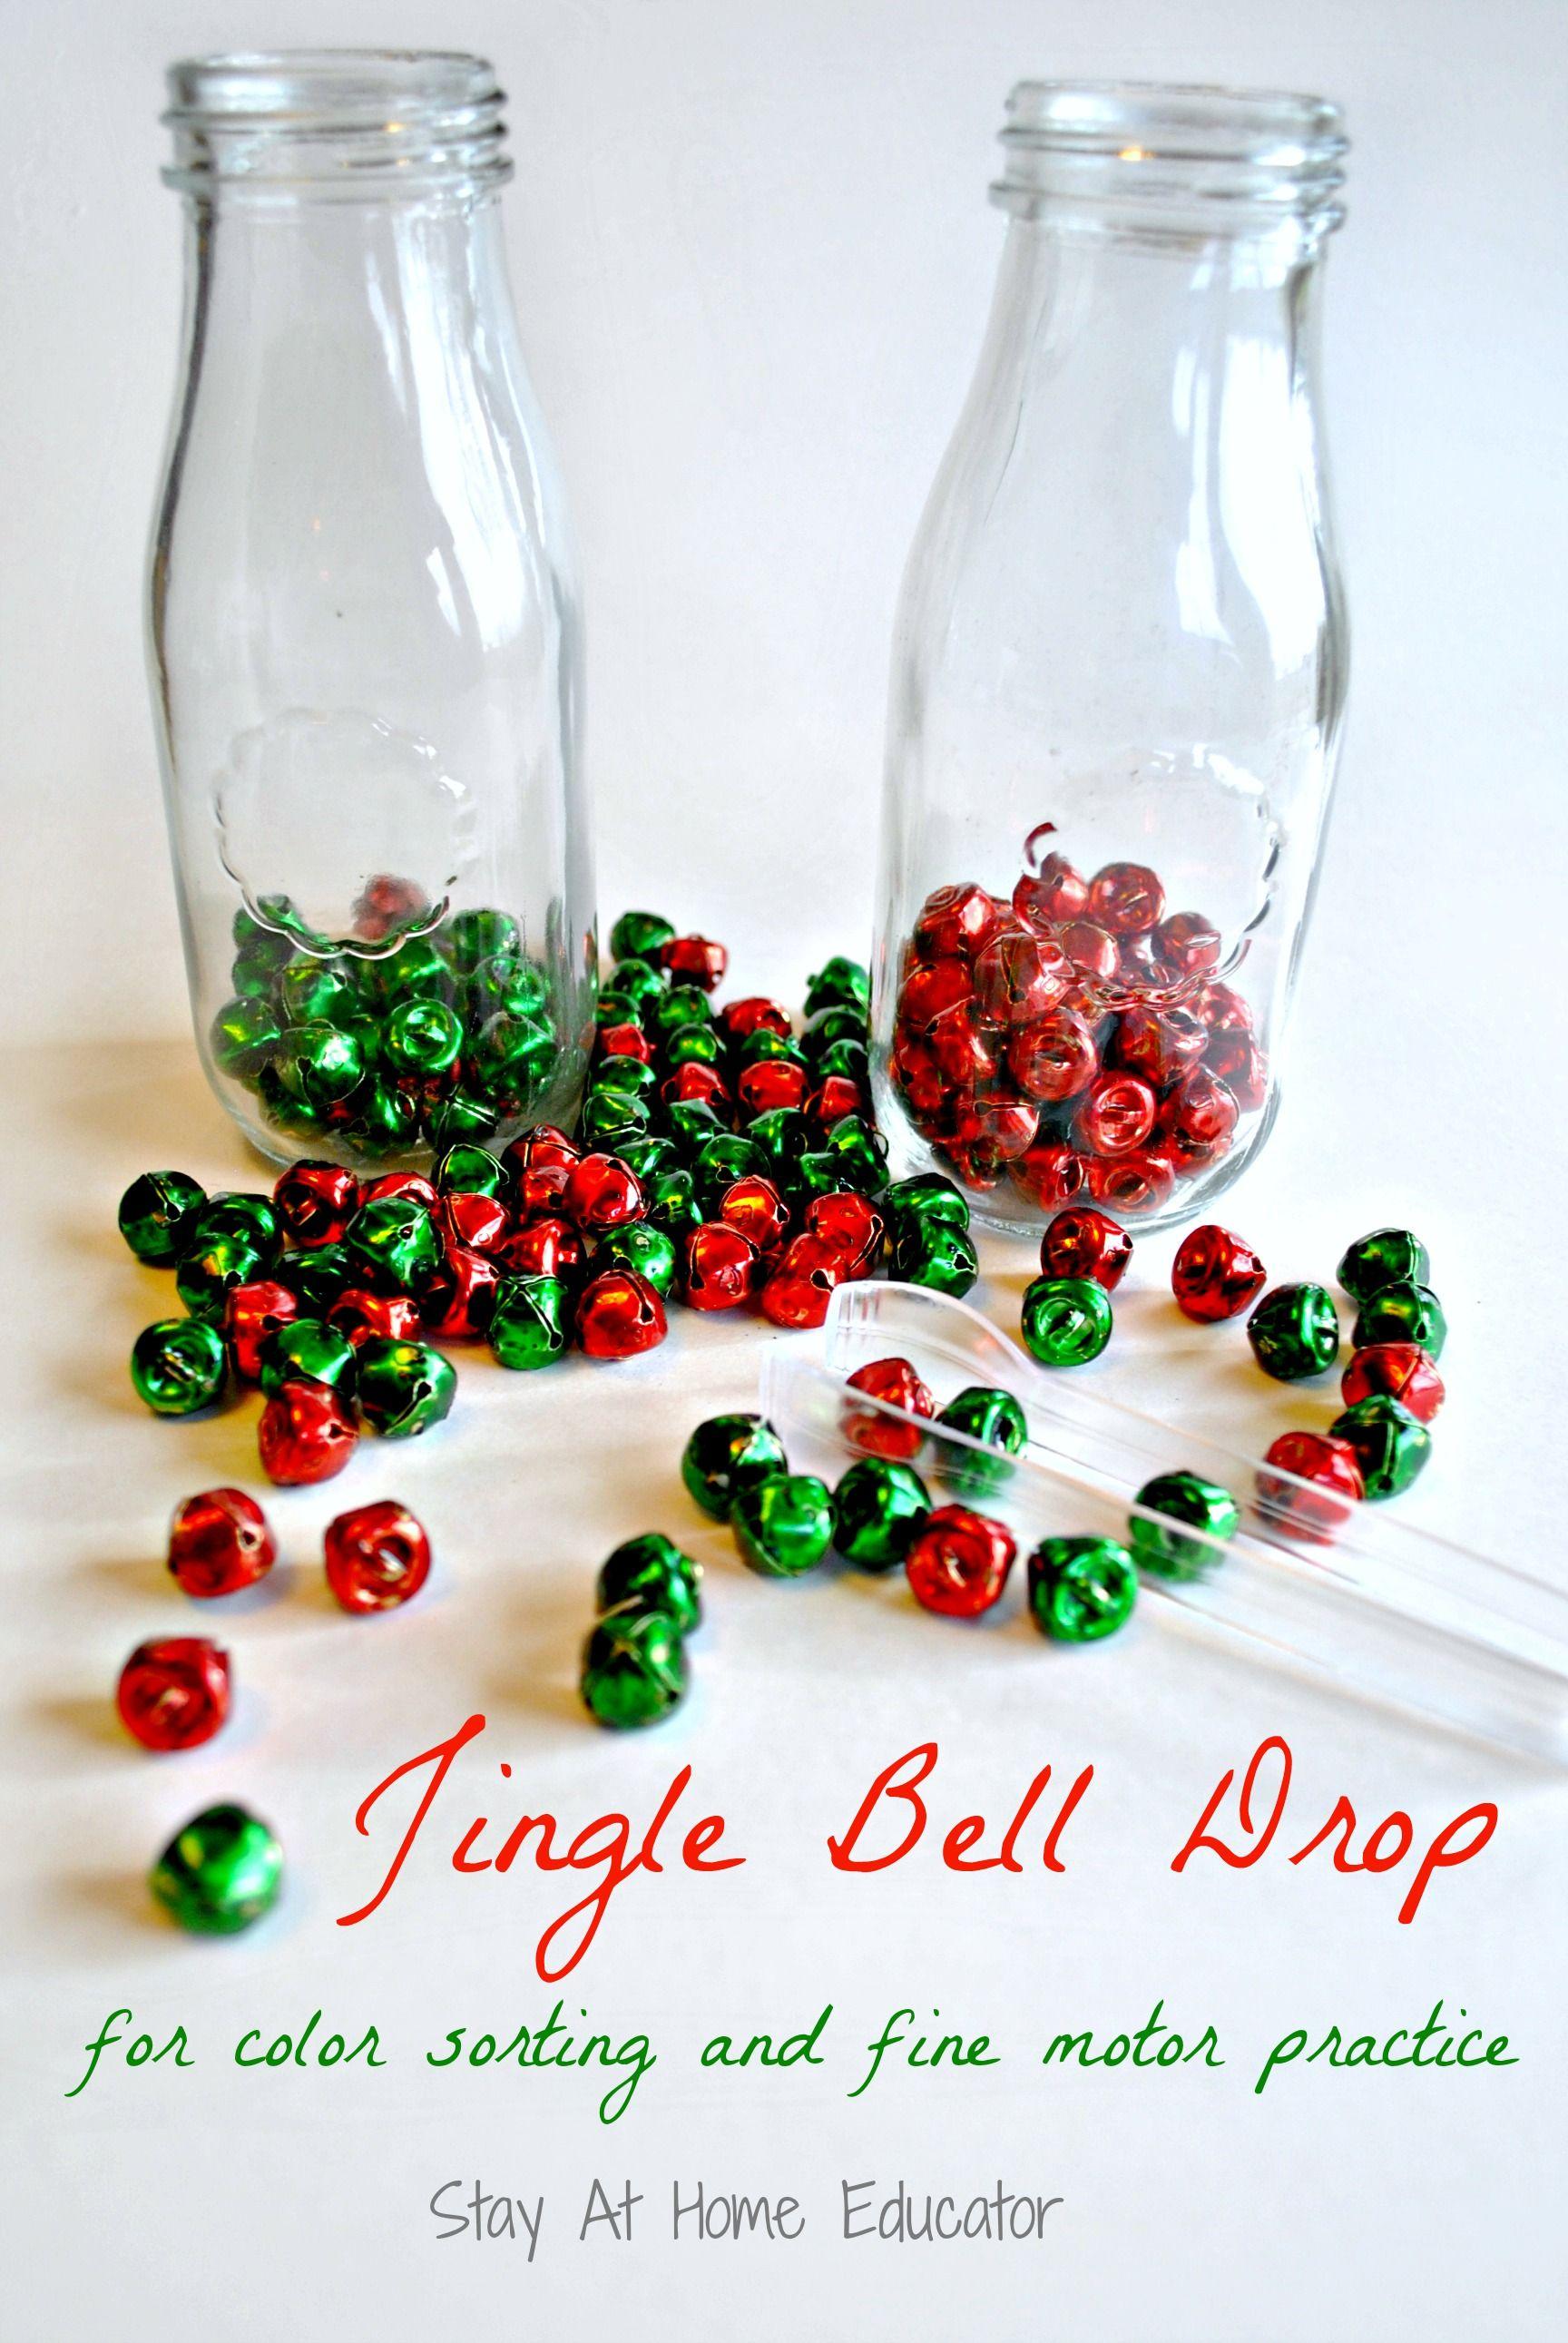 Jingle Bell Drop